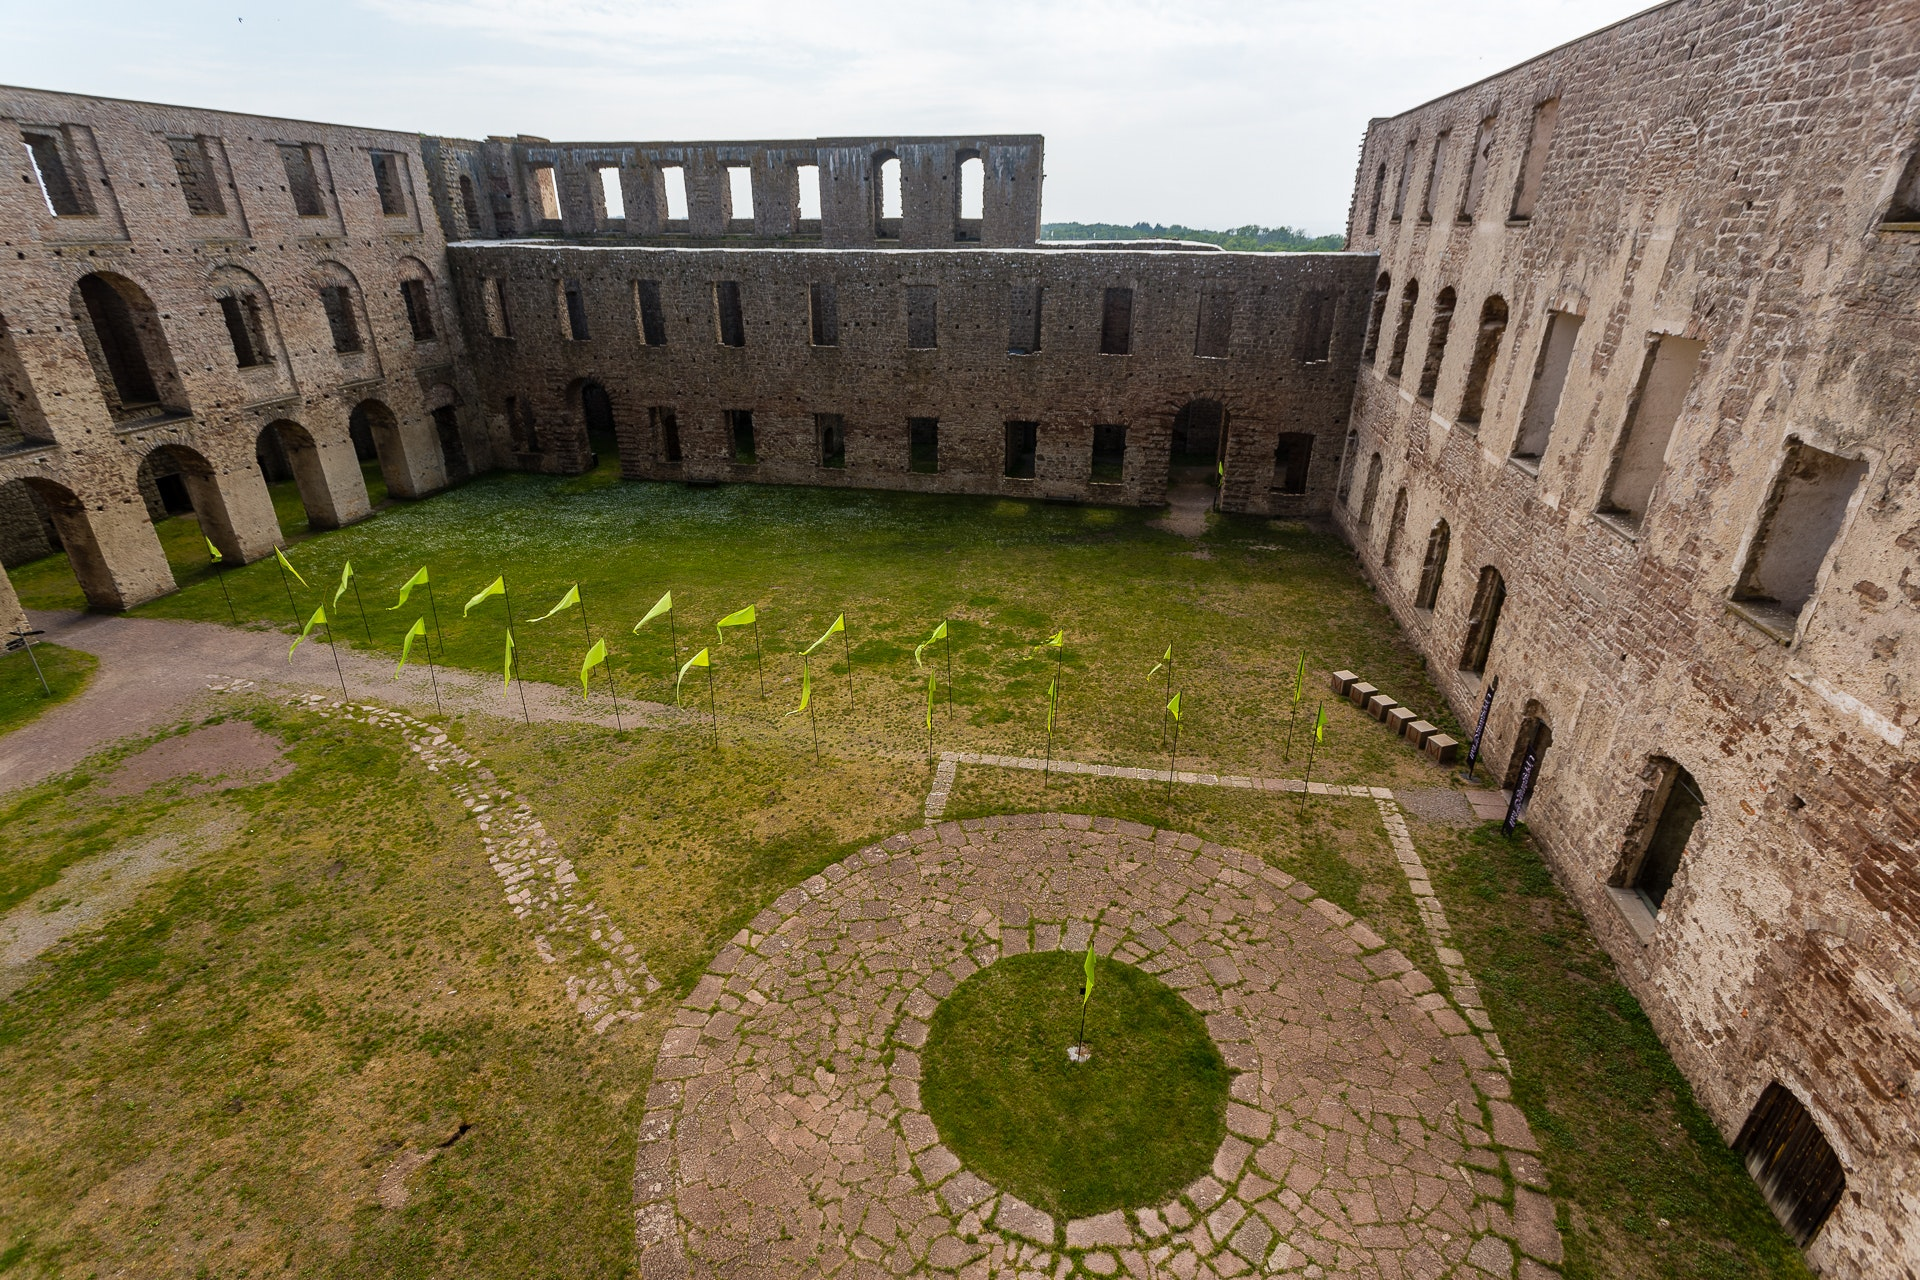 Borgholms Slott Courtyard